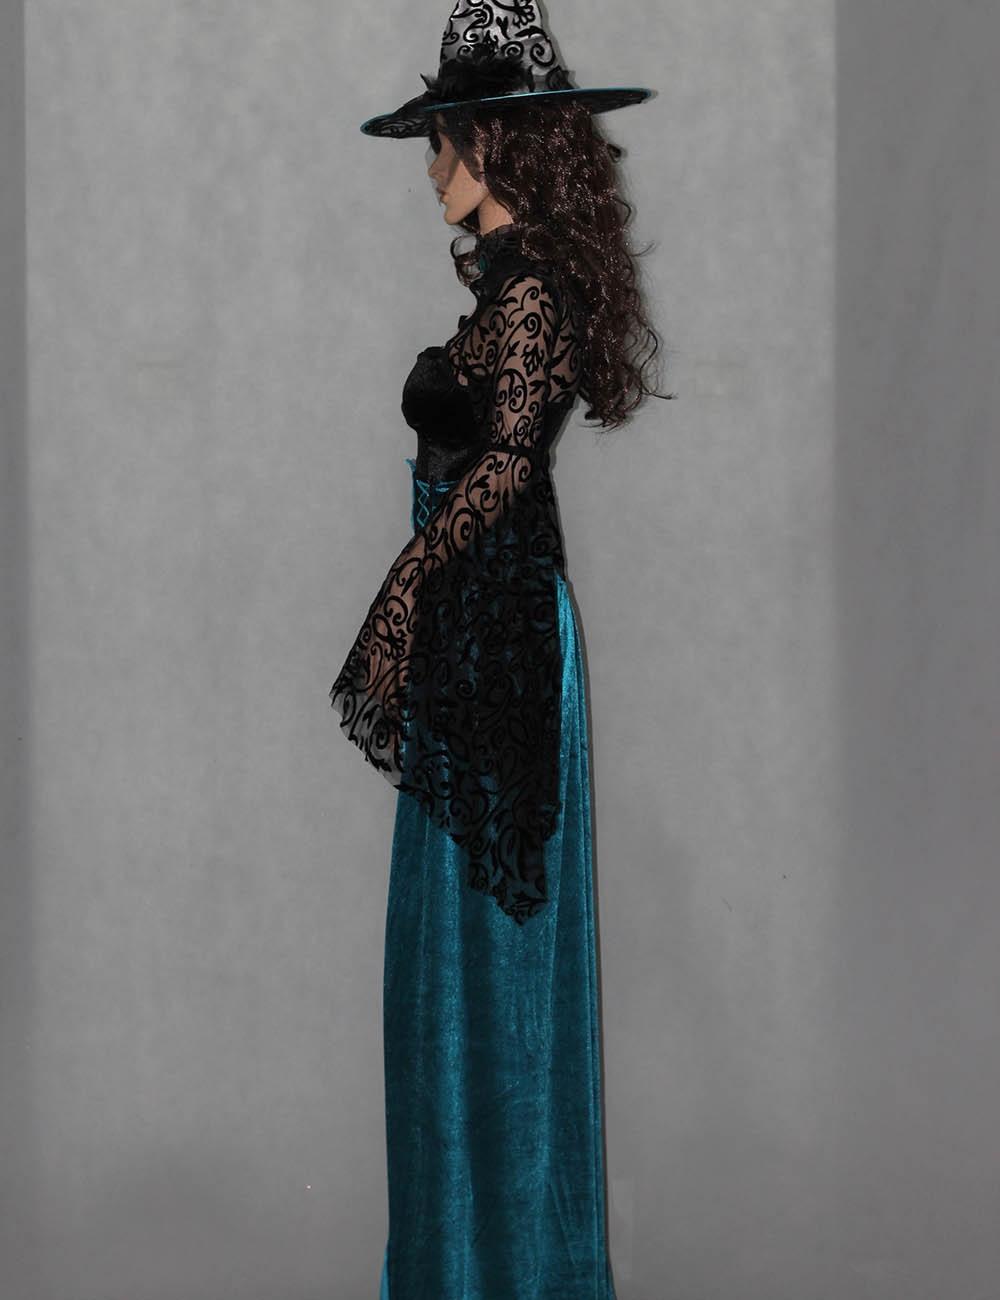 Aliexpress.com : Buy Lover baby Spirit Halloween Enchantress Adult ...